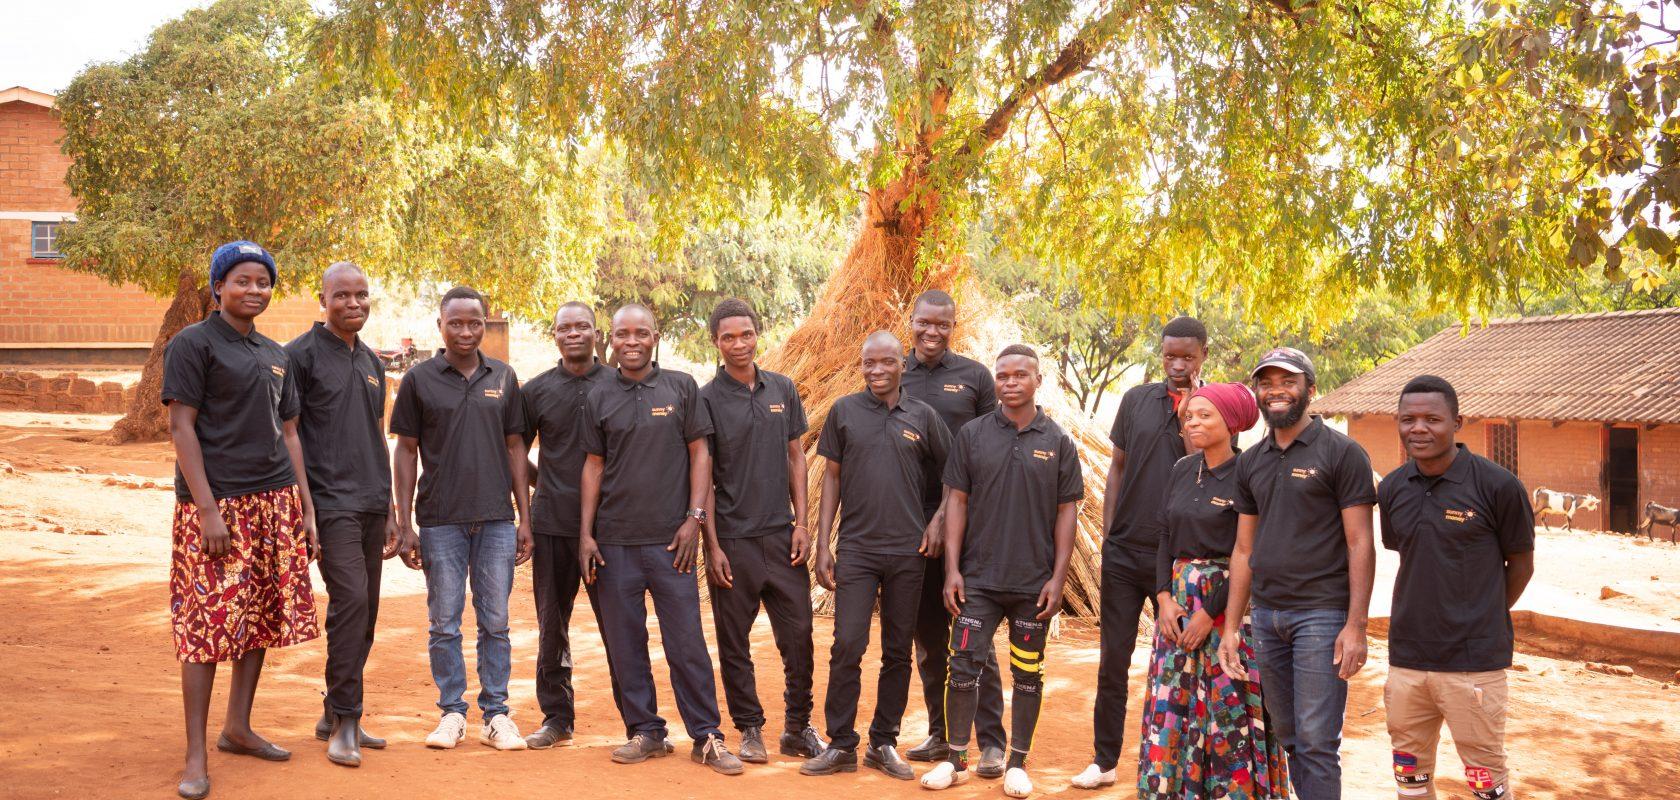 Group of customer service representatives